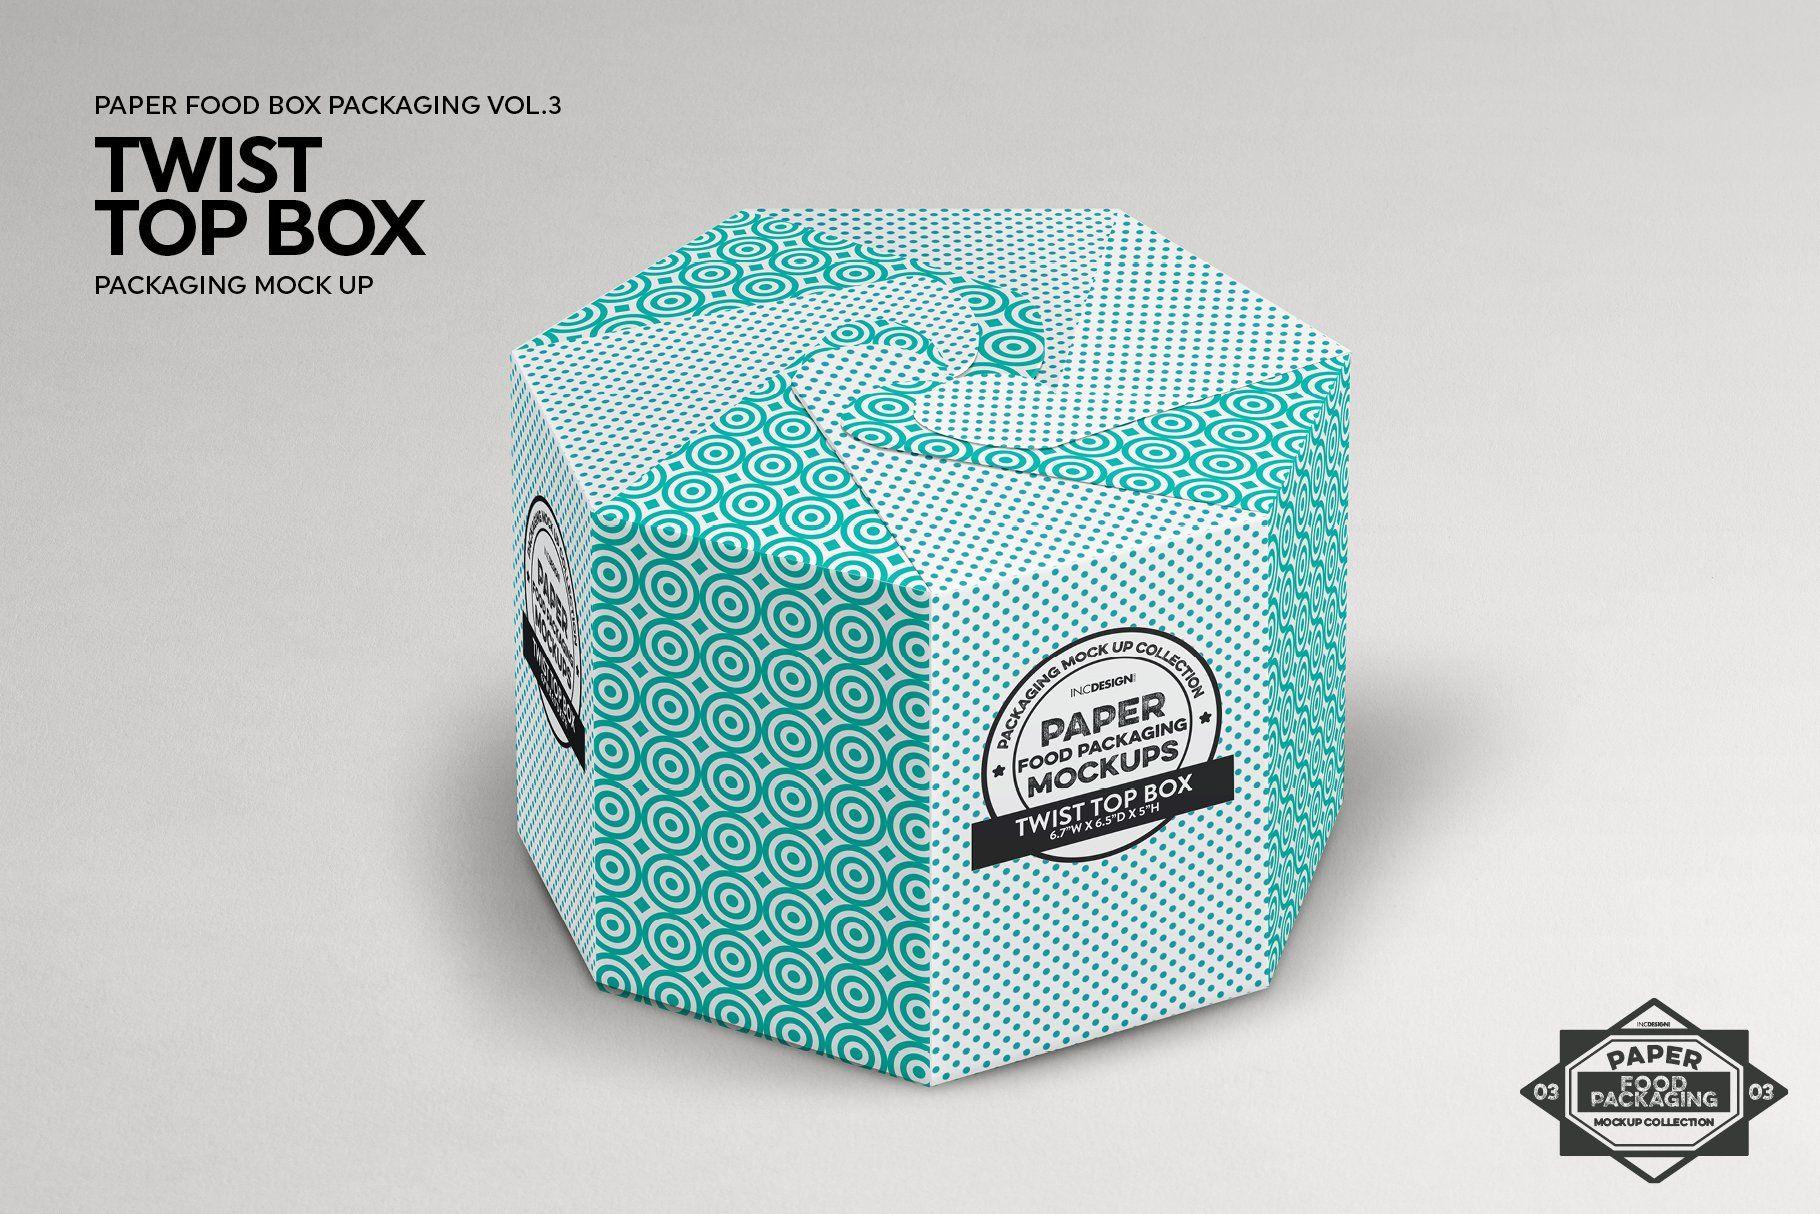 Download Twist Top Box Packaging Mockup Packaging Mockup Free Packaging Mockup Food Box Packaging